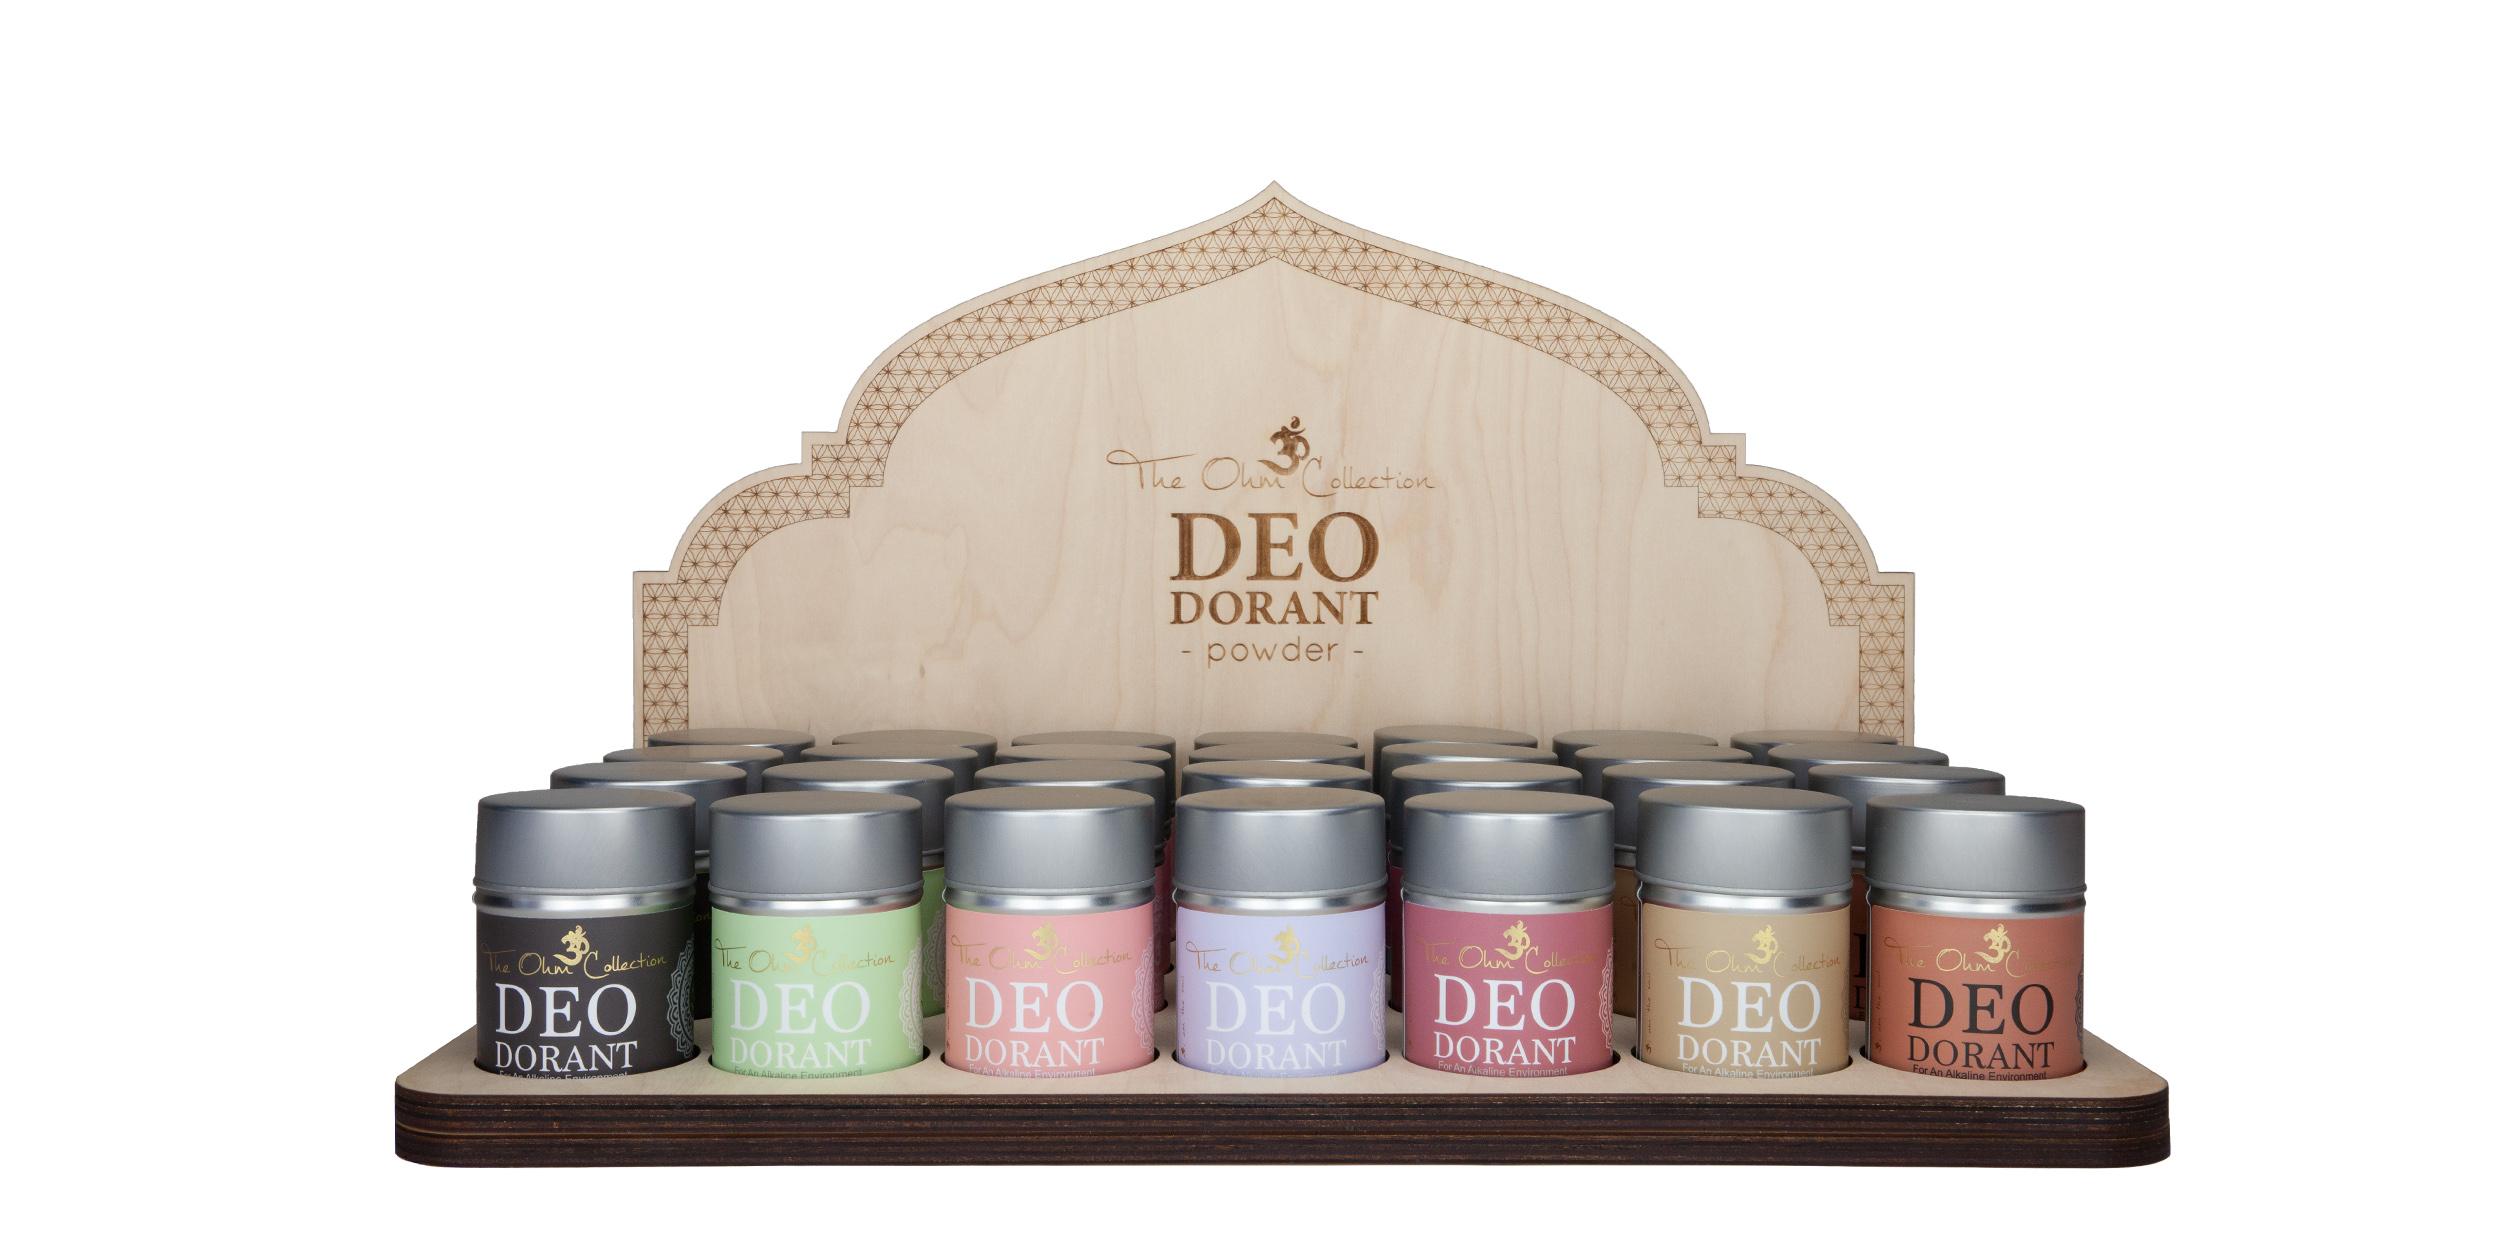 deodorant powder safe effective natural organic vegan sensitive hypoallergenic